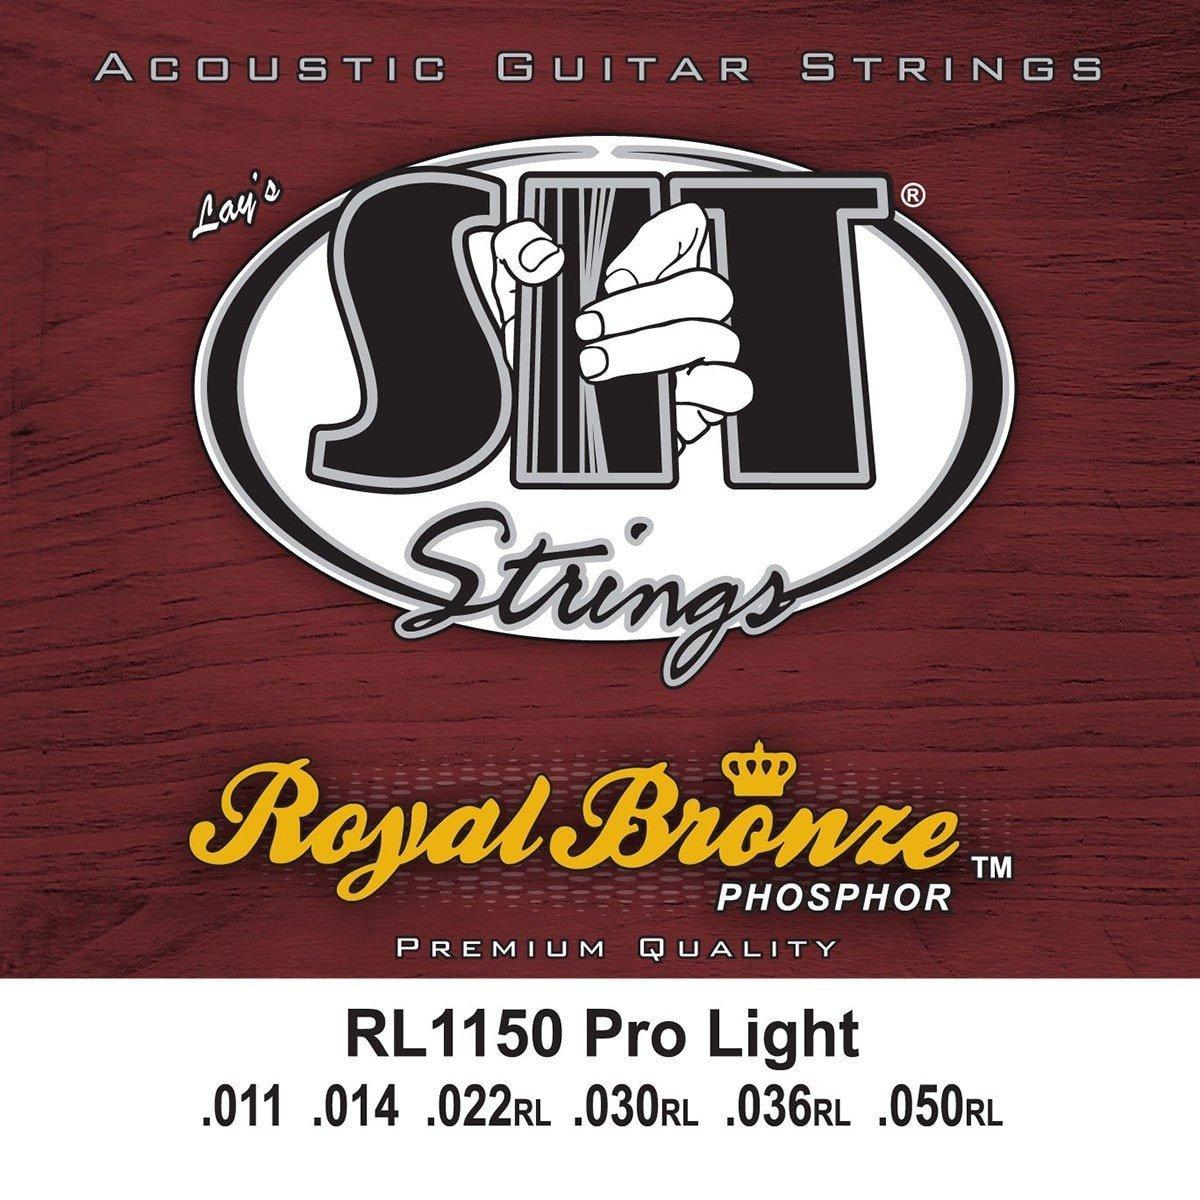 SIT Royal Bronze Acoustic Guitar Strings